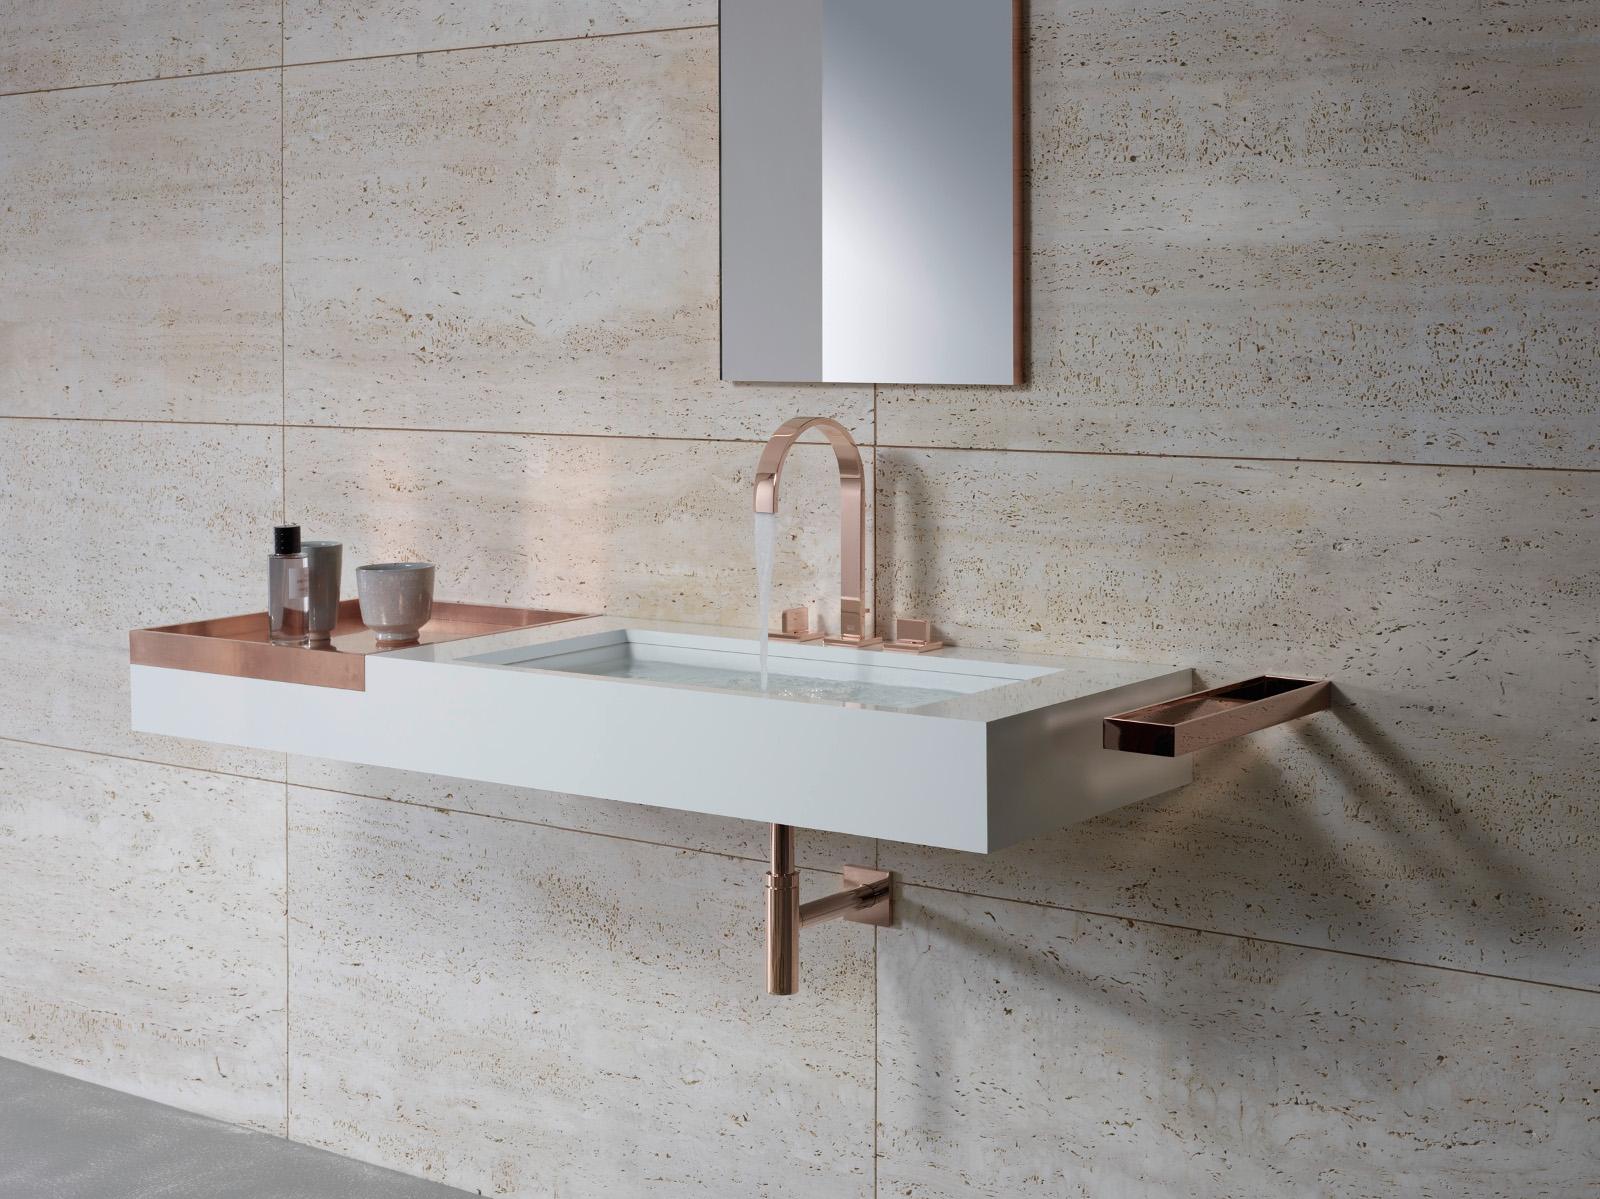 Ideas, dornbrachts sleek mem faucet dornbrachts sleek mem faucet kitchen dornbracht shower heads best grohe kitchen faucet 1600 x 1199  .